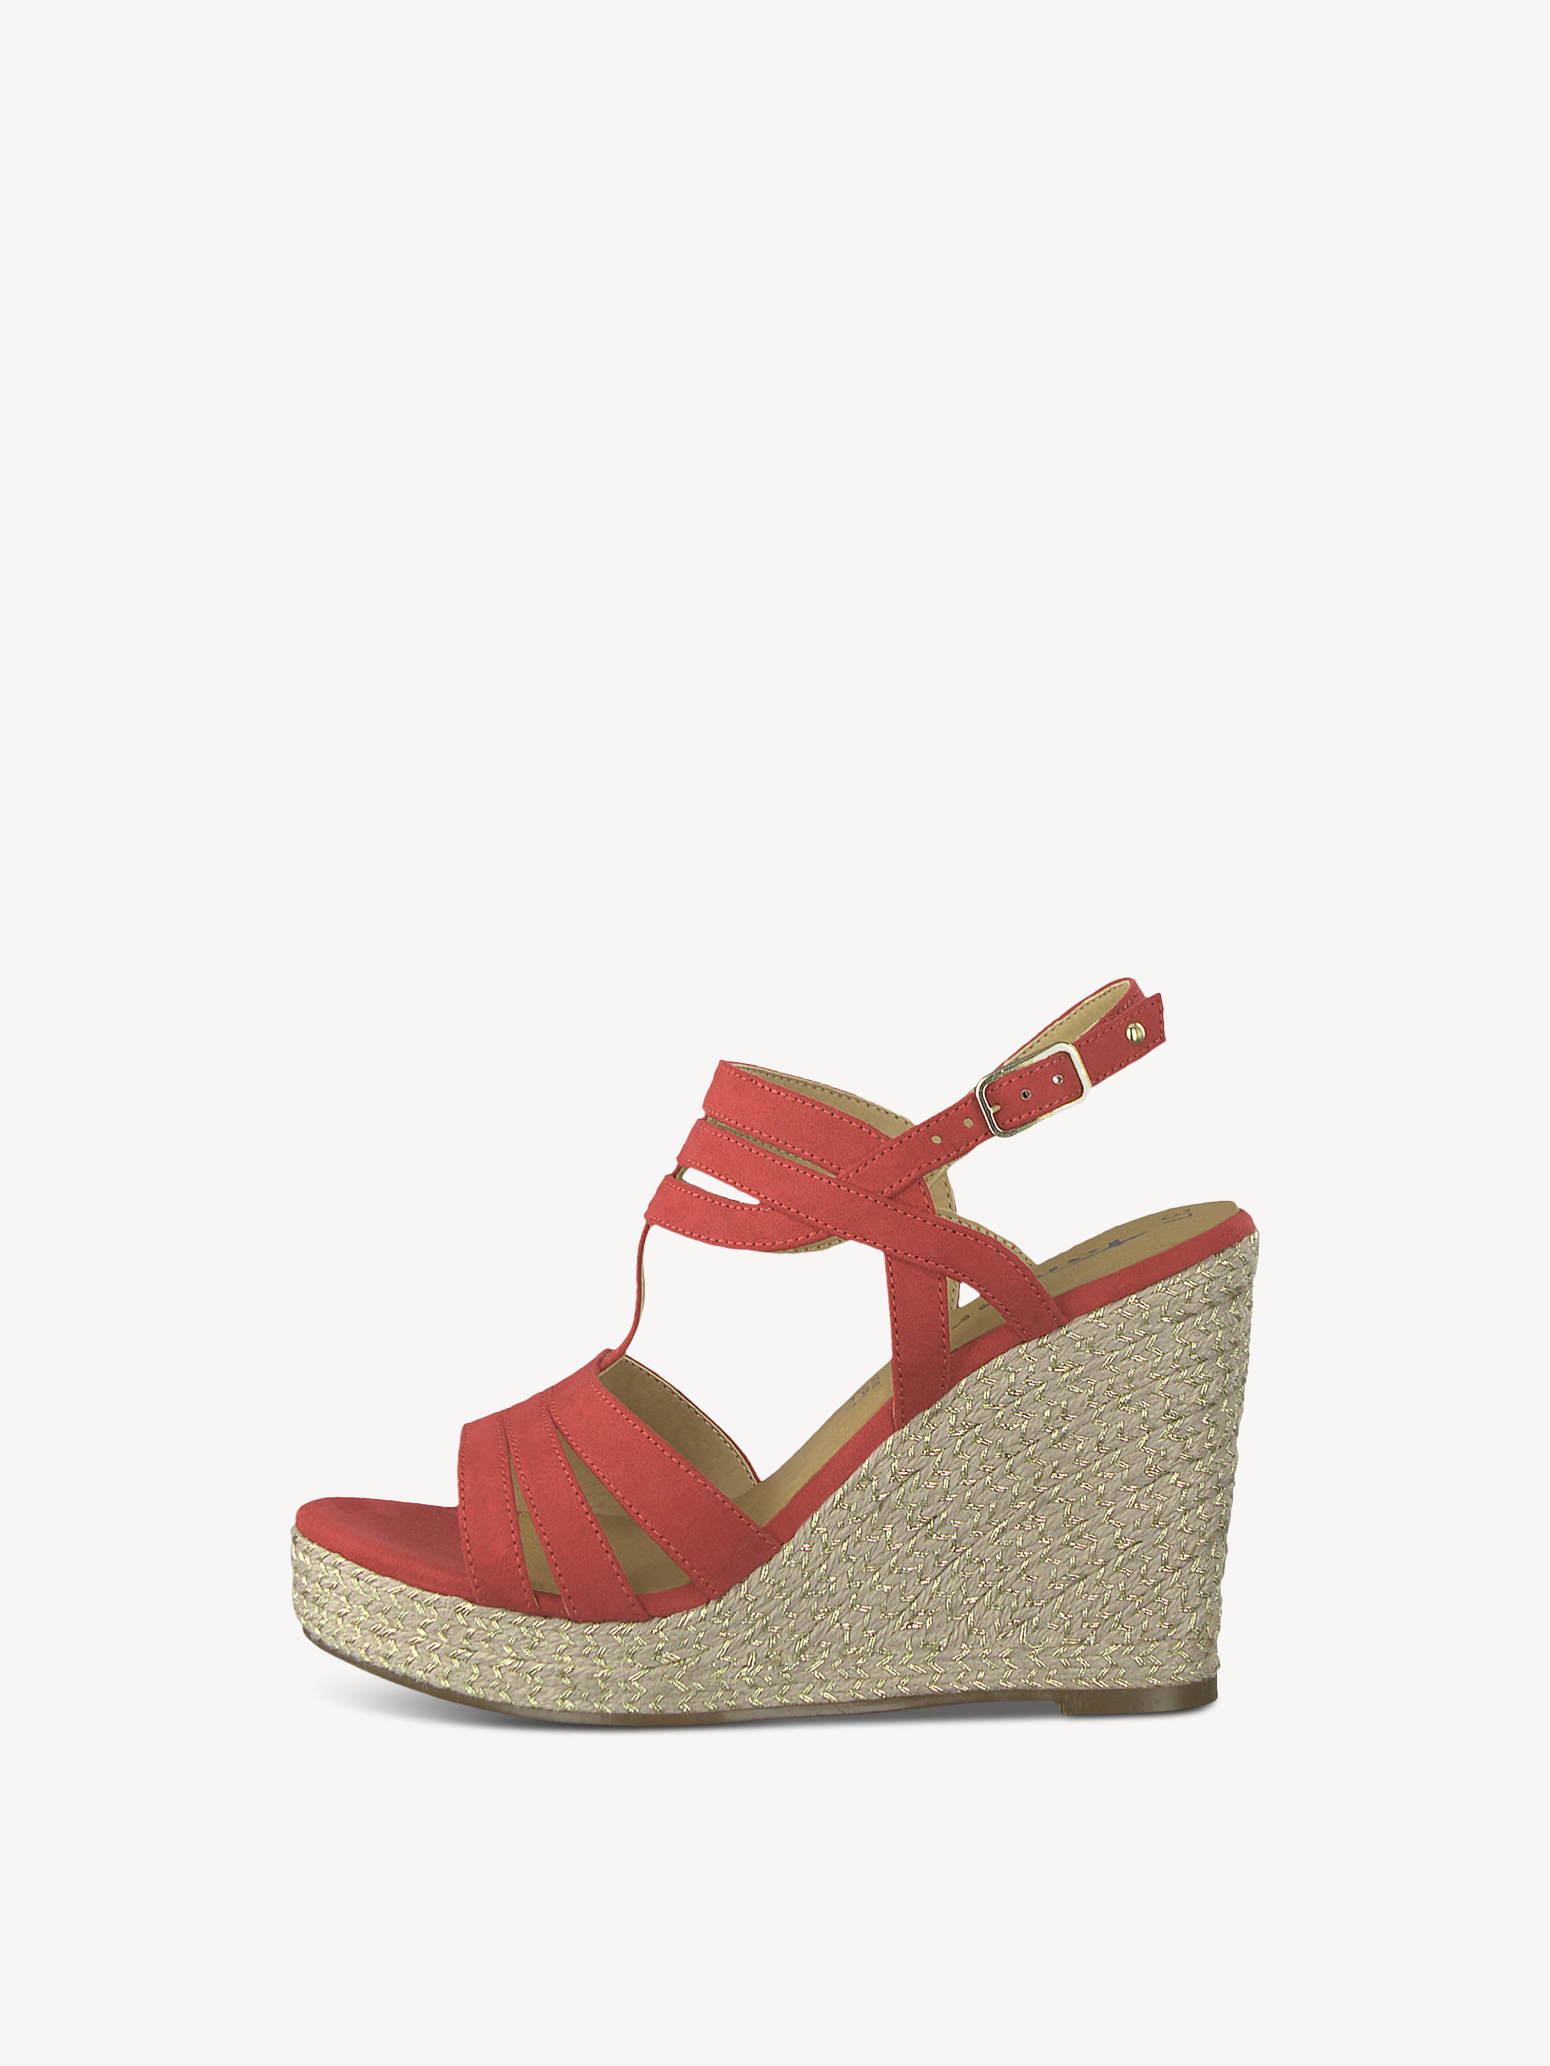 Tamaris 1 1 29605 22 515 rot Schuhe Sandalen Sandaletten